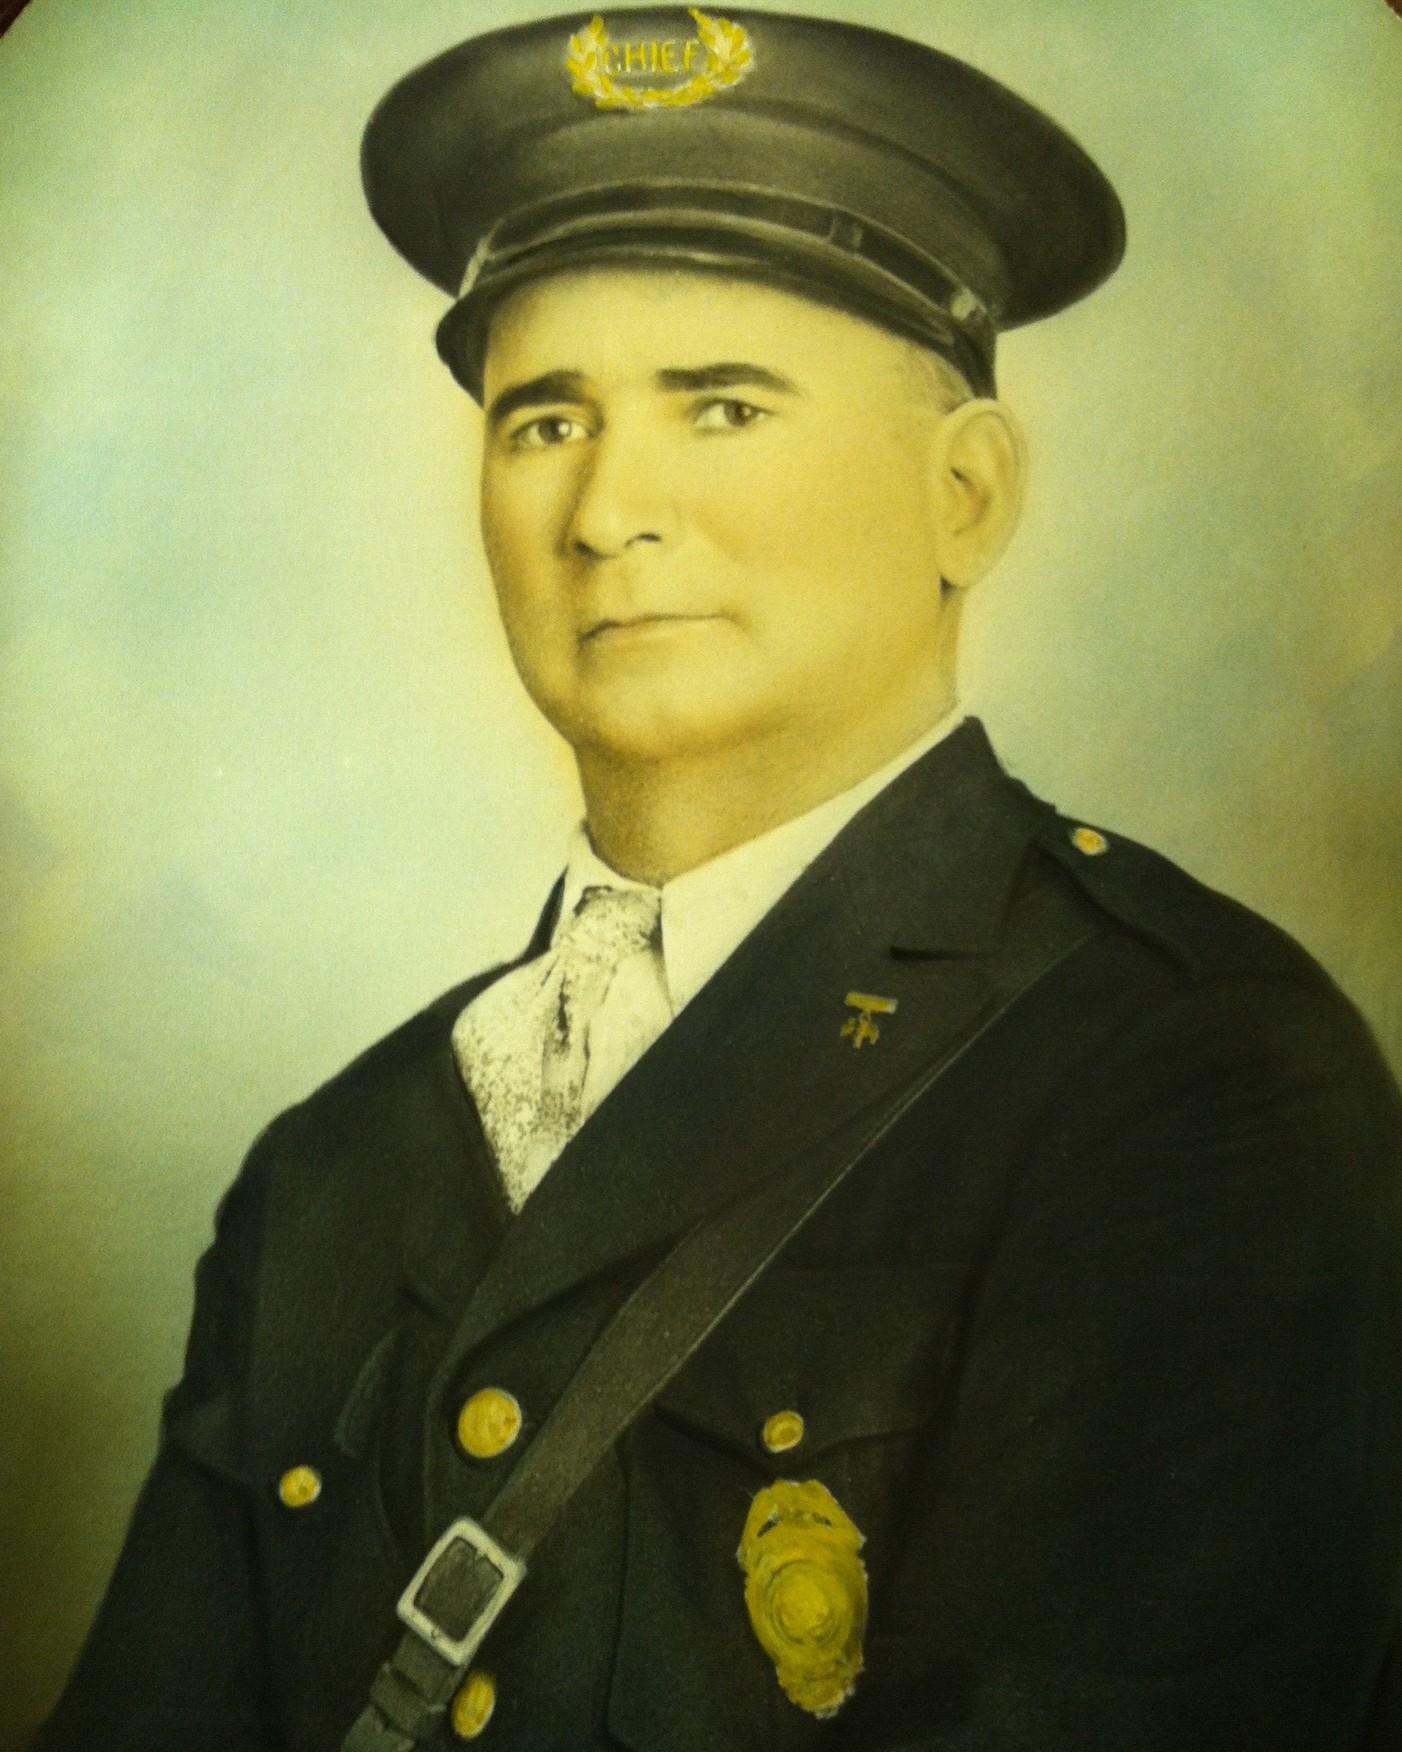 City Marshal Apolonio Pino | Santa Fe Police Department, New Mexico